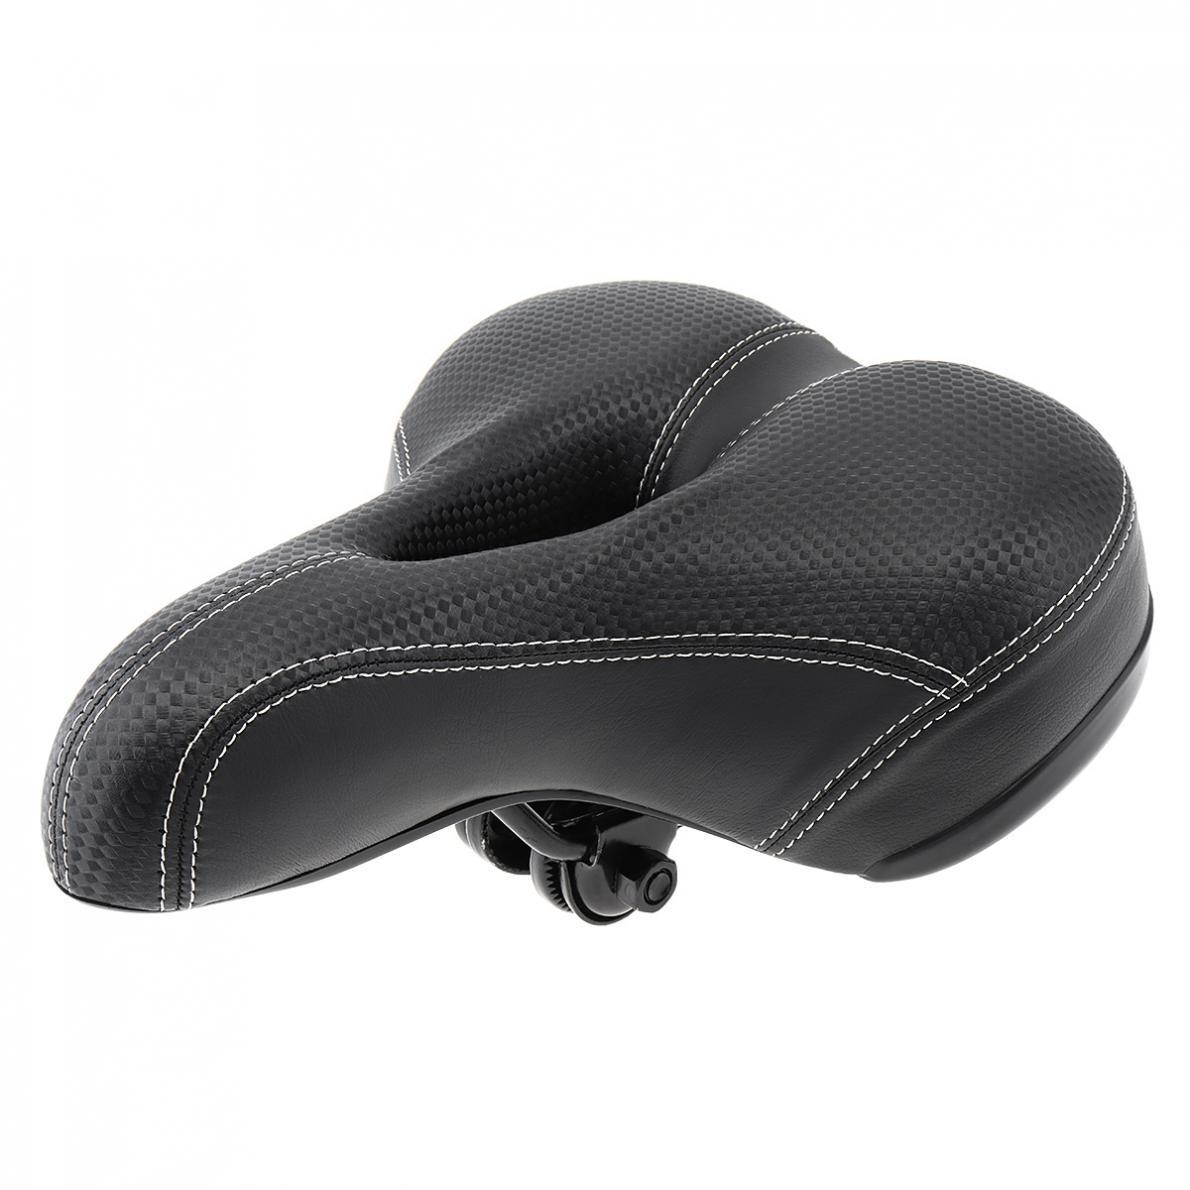 Bicycle Seat Thicken Wide Bike Saddle Seat Cycling Saddle MTB Cushion